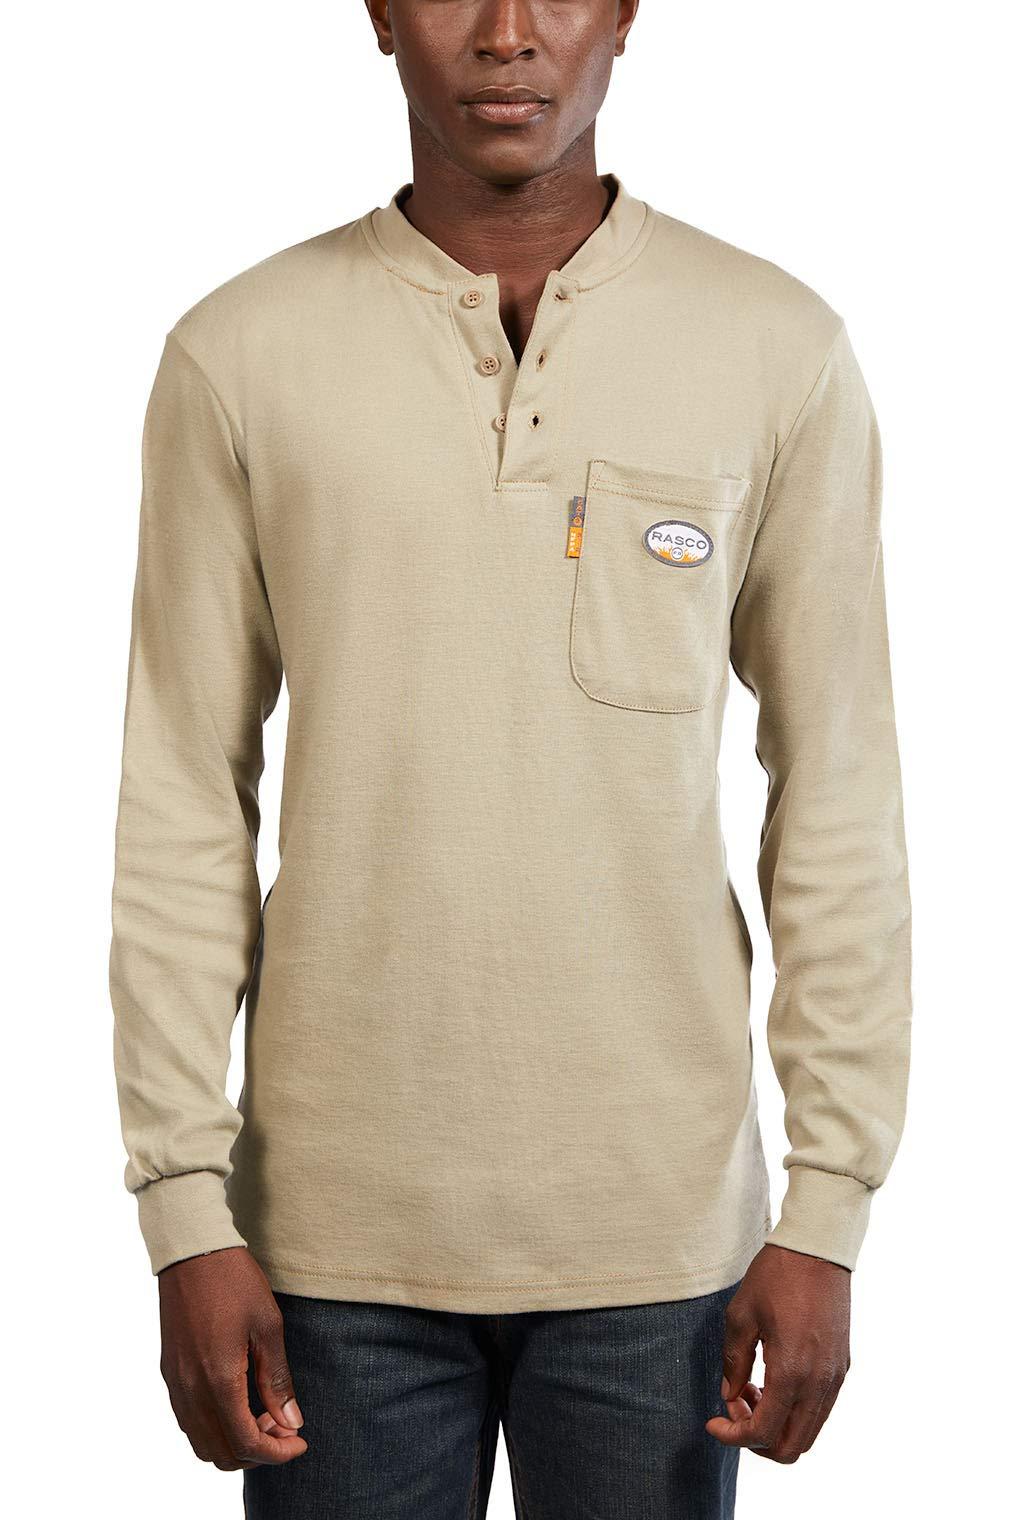 Rasco FR Khaki Henley T-Shirt 100% Cotton - 6X-Large